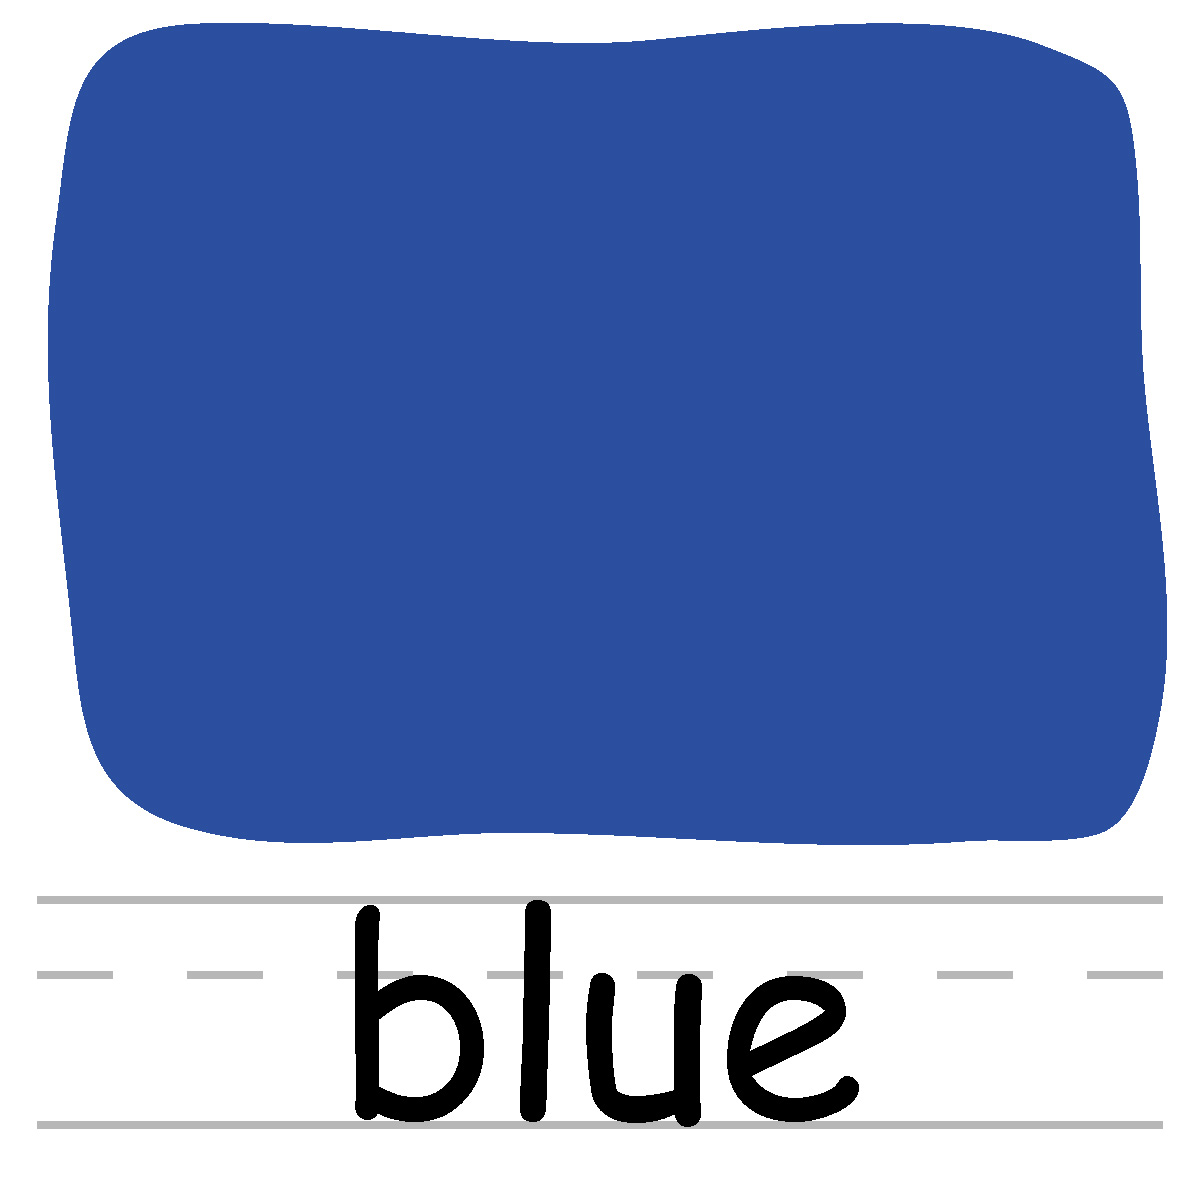 blue clip art 4 1200x1200 clipart panda free clipart images rh clipartpanda com blue clipart border blue clipart flowers